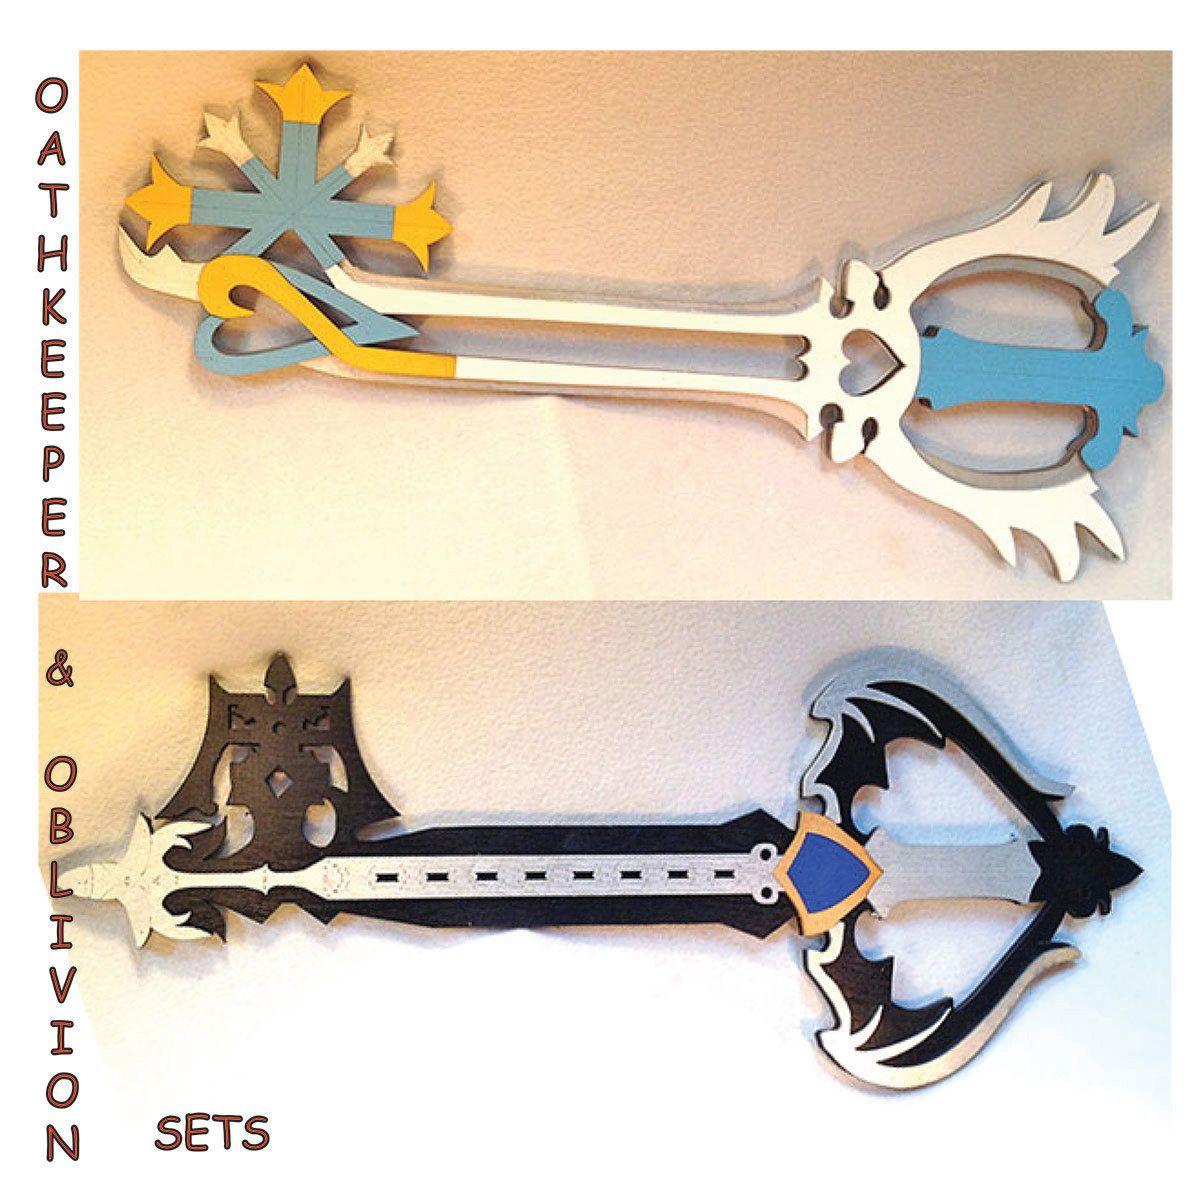 Radient Disney Square Enix Kingdom Hearts Metal Keyblade Cosplay Or Decor Collectibles Knives, Swords & Blades